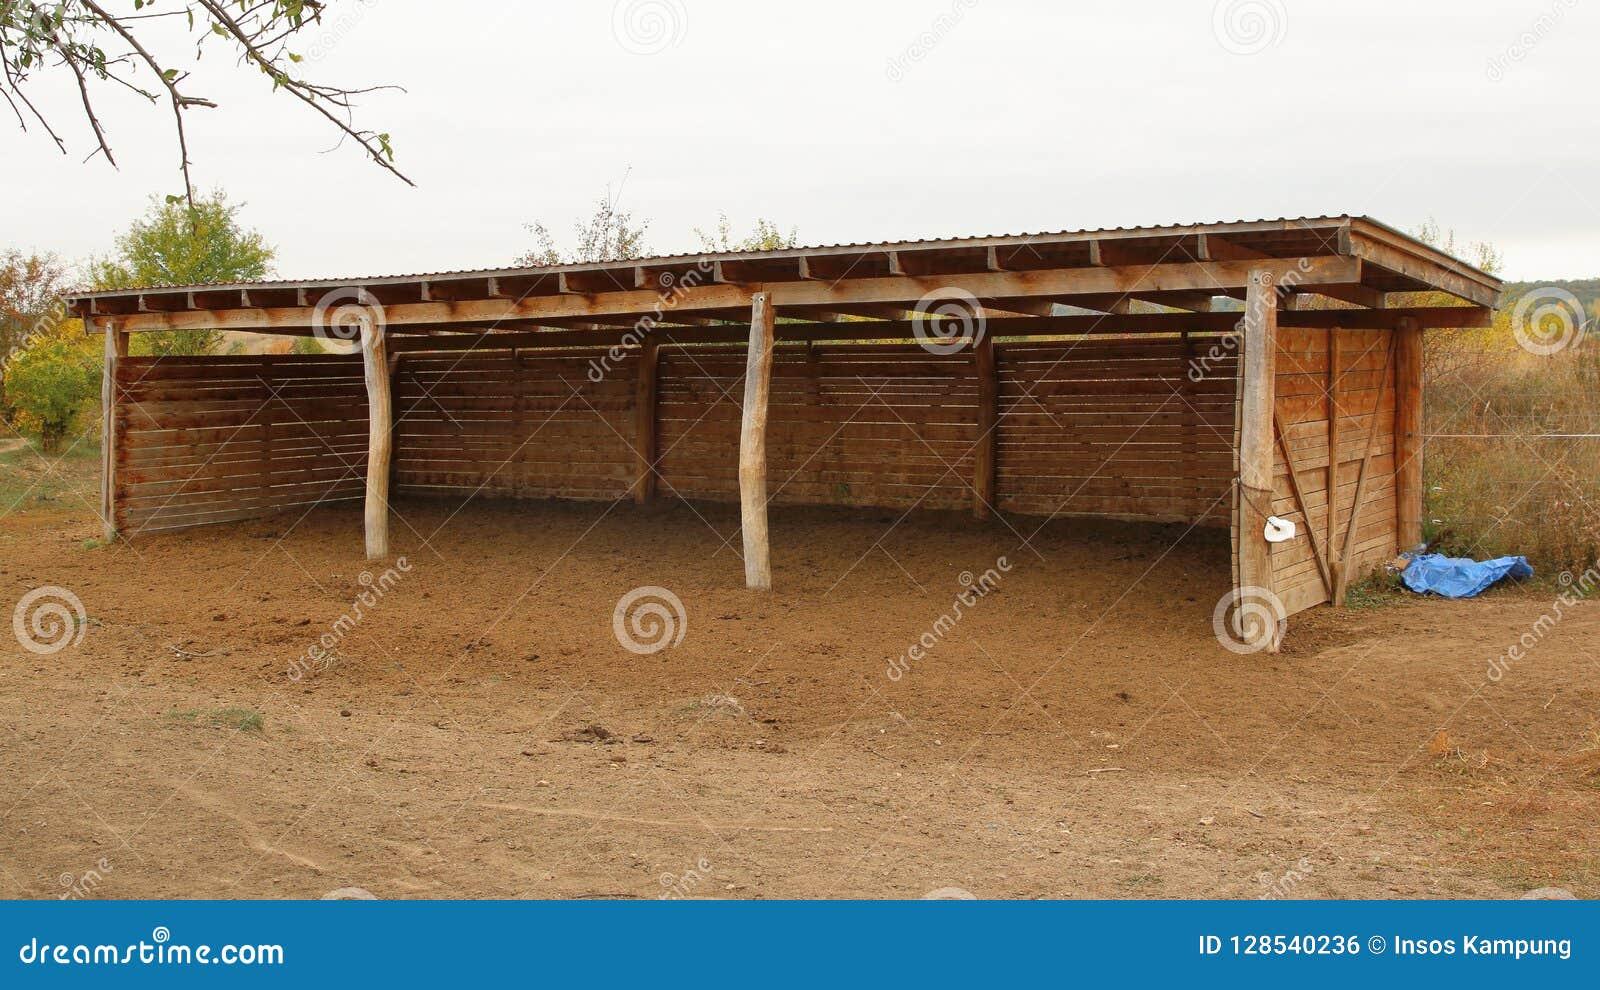 Horse Shelter In Milovice Czechia Stock Photo Image Of Base Wooden 128540236